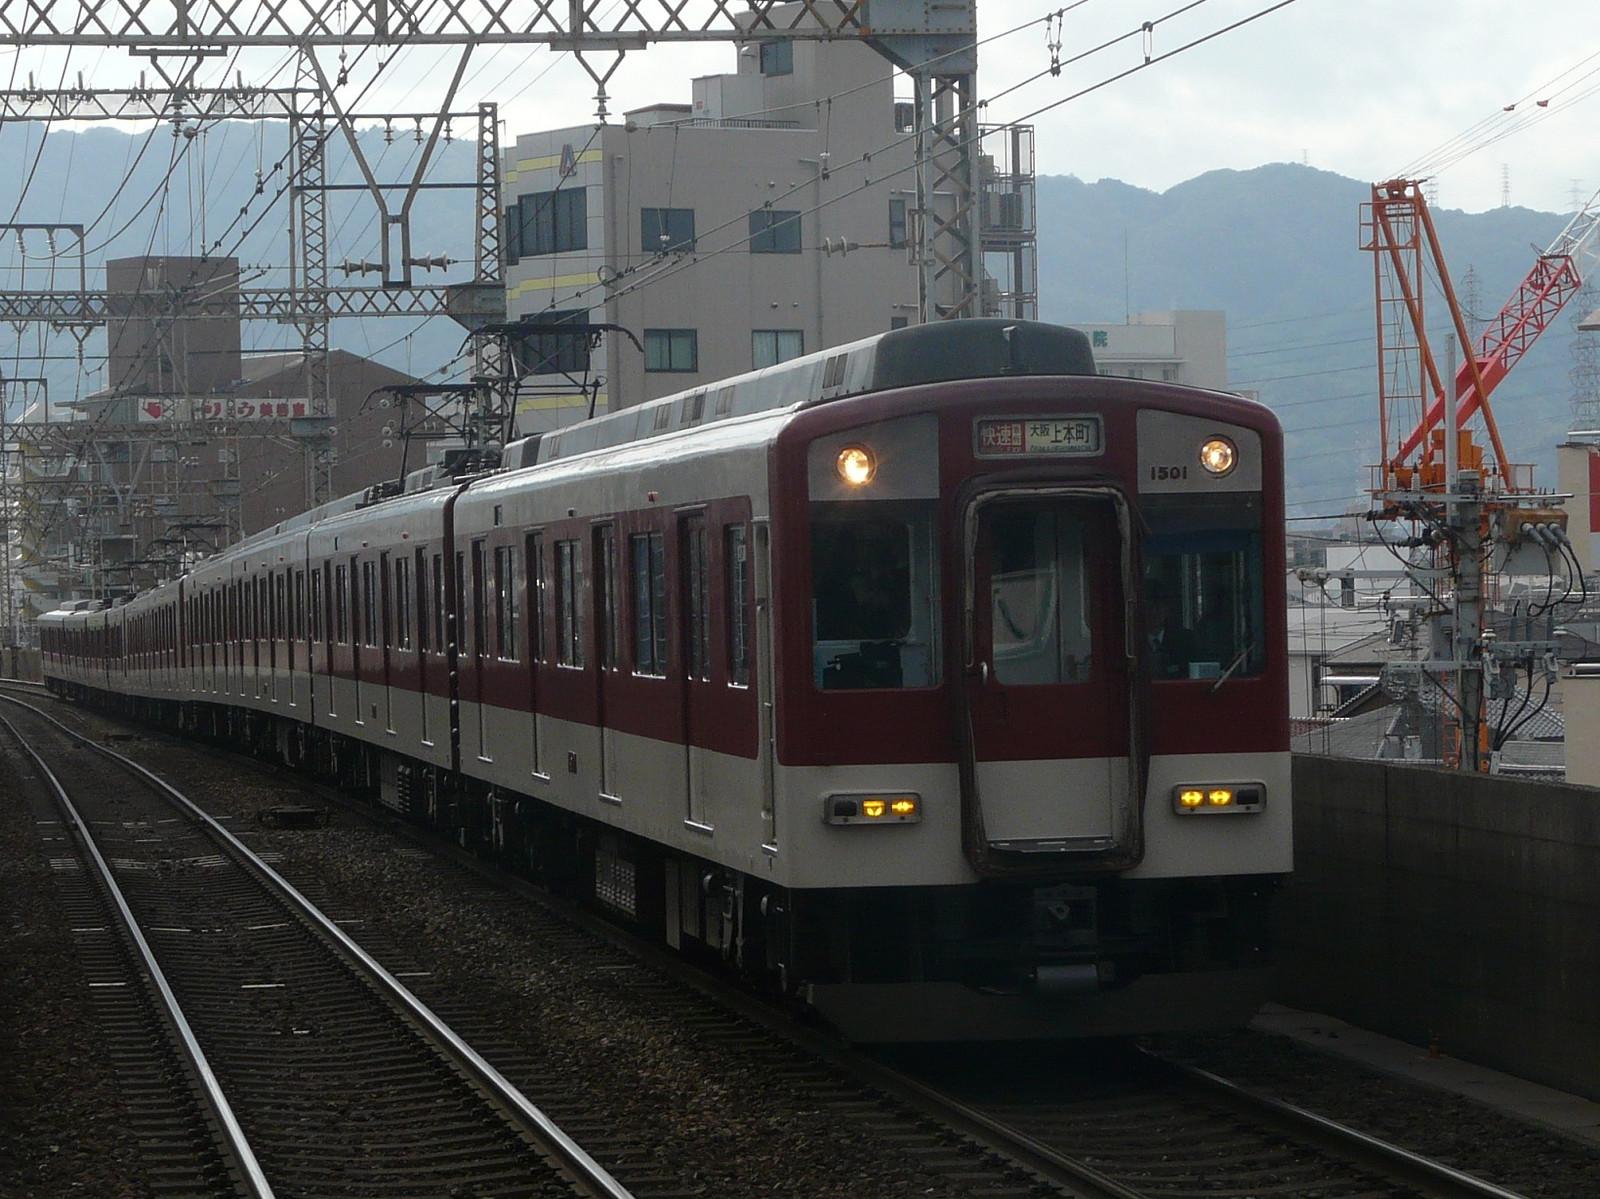 P1220986_2